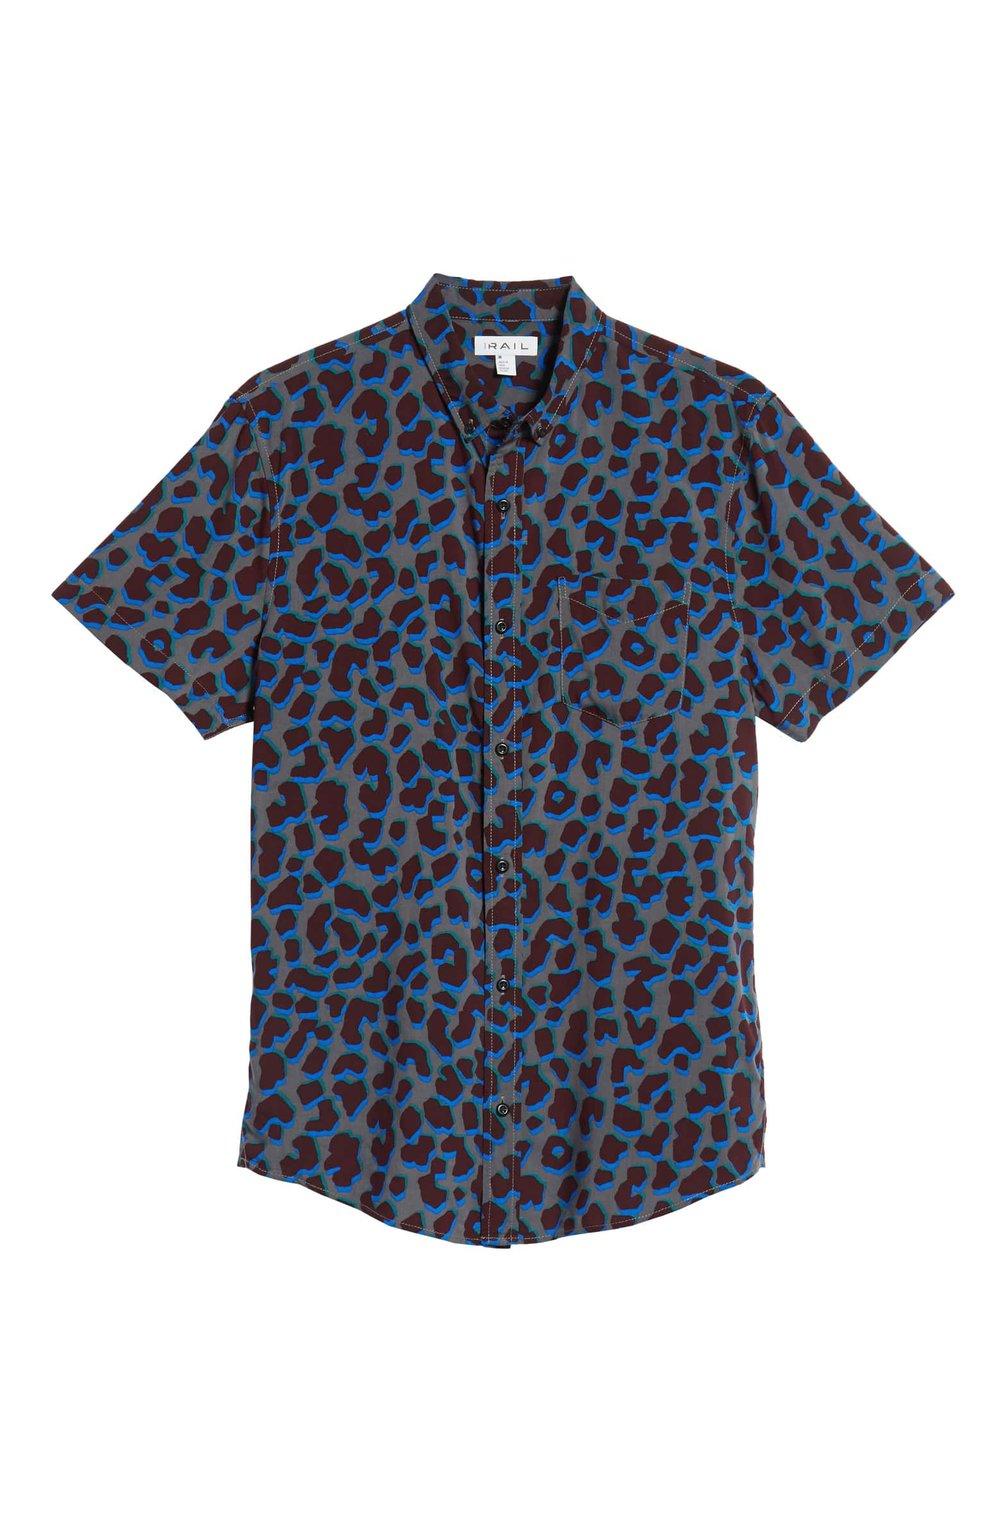 The Rail Blue Burgundy Leopard Print Shirt.jpeg